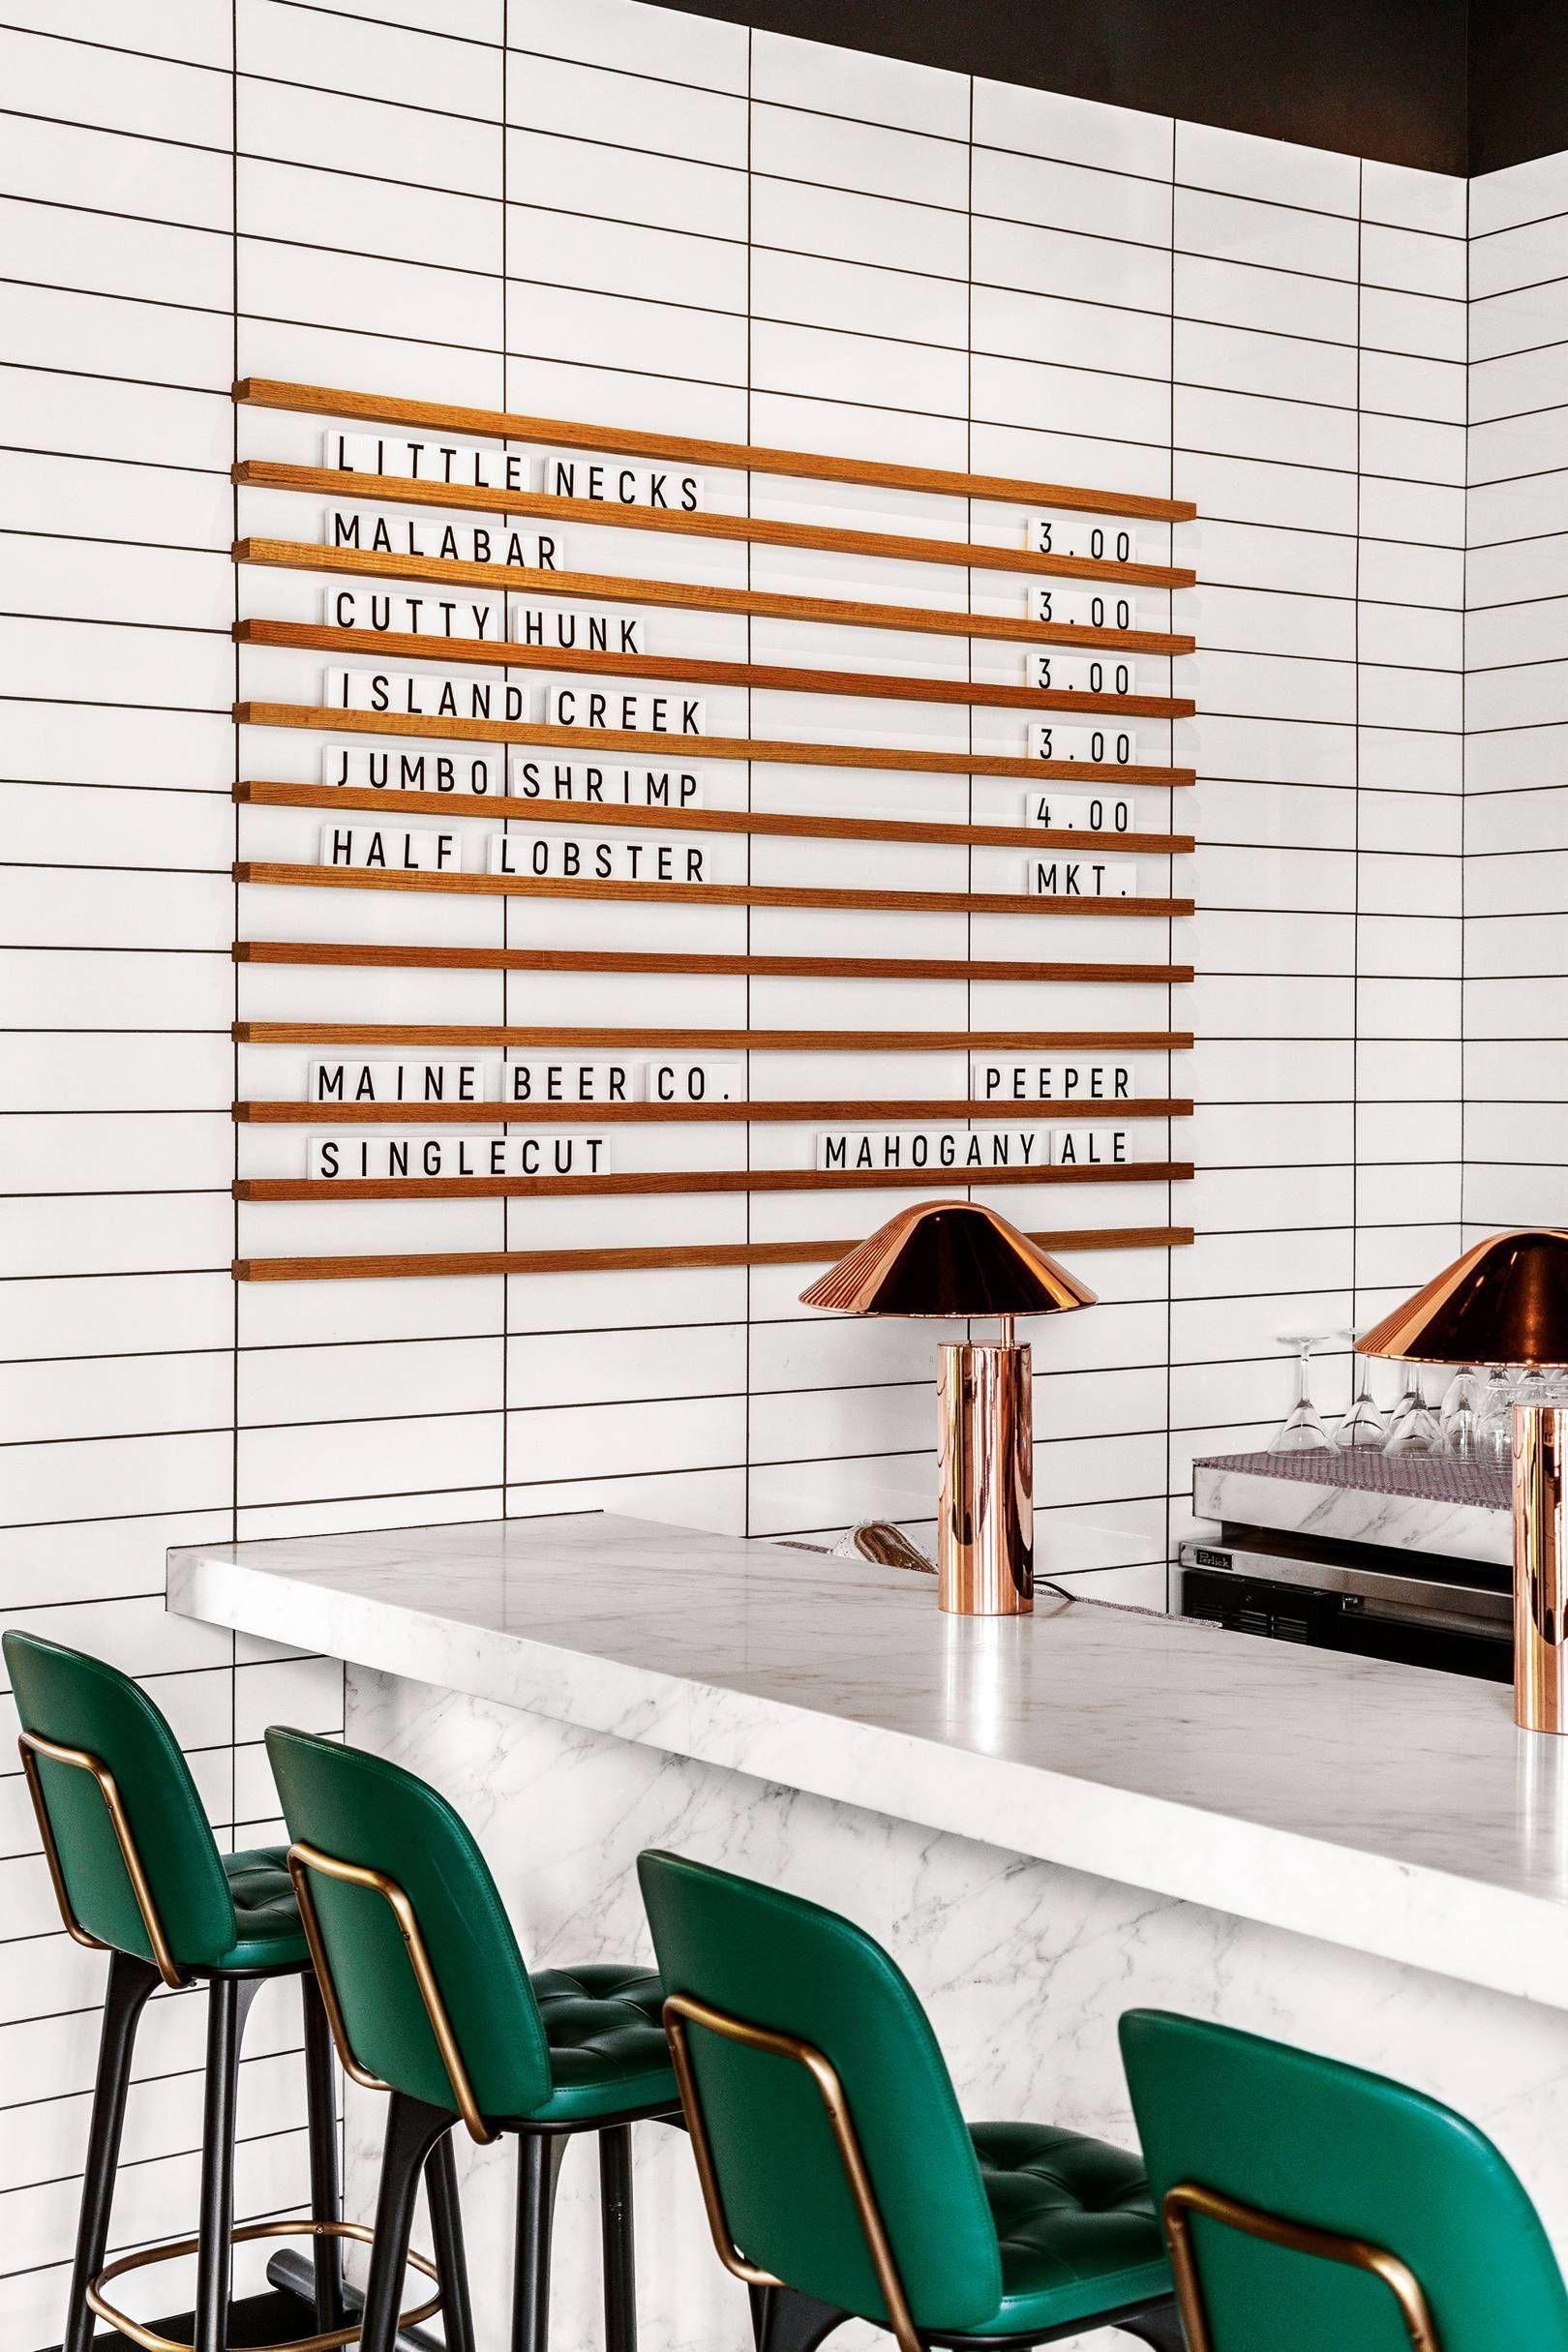 50 Stunning Interior Design Ideas That Will Take Your House To Another Level: Stunning Interior Design, Green Interior Design, Restaurant Interior